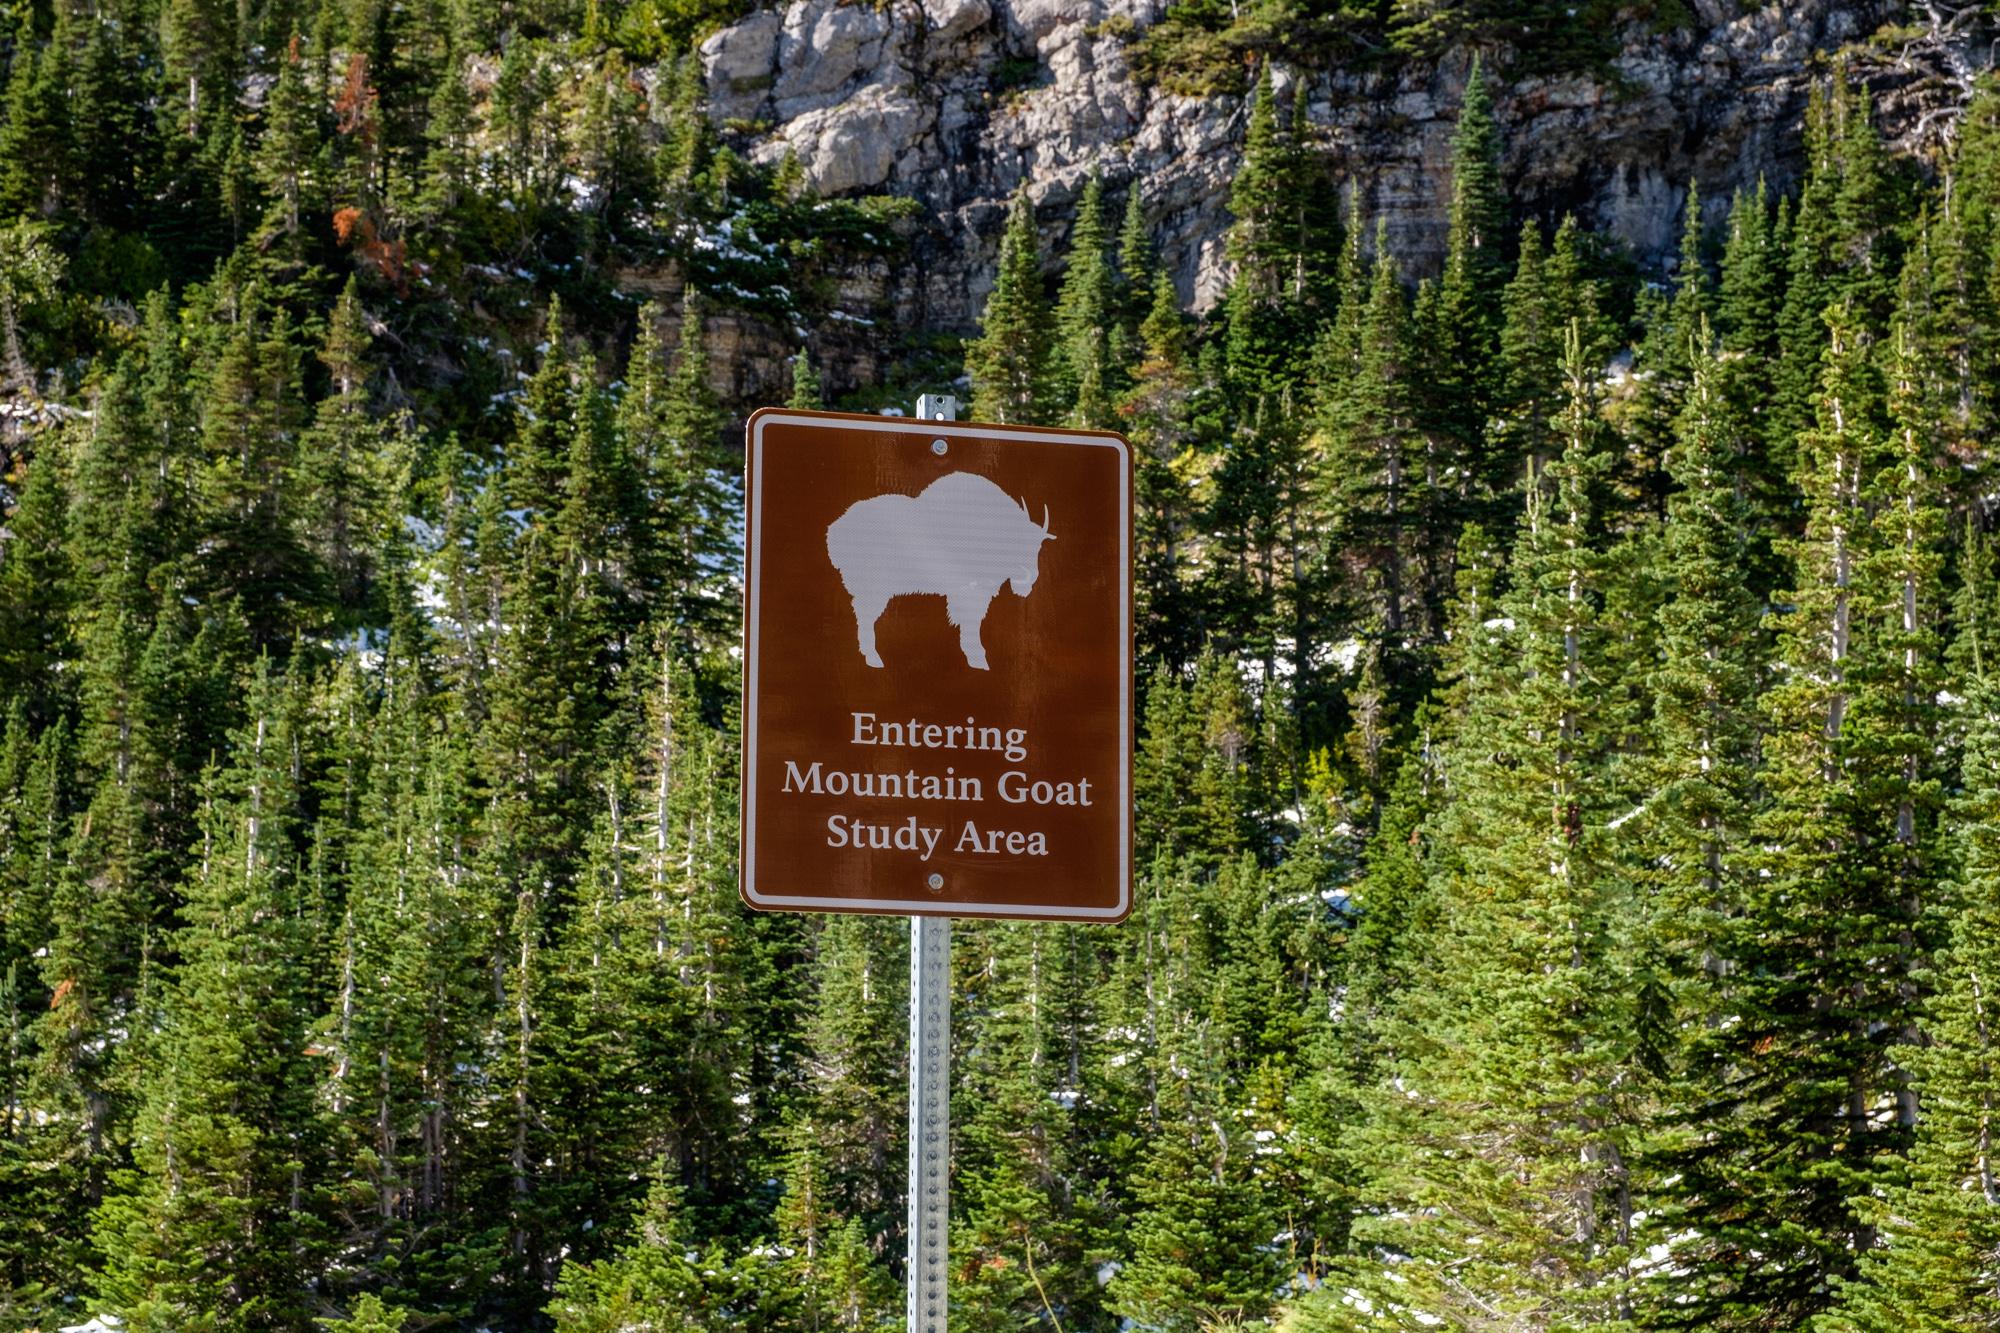 20160913-SP-Glacier National Park-_DSF2528.jpg